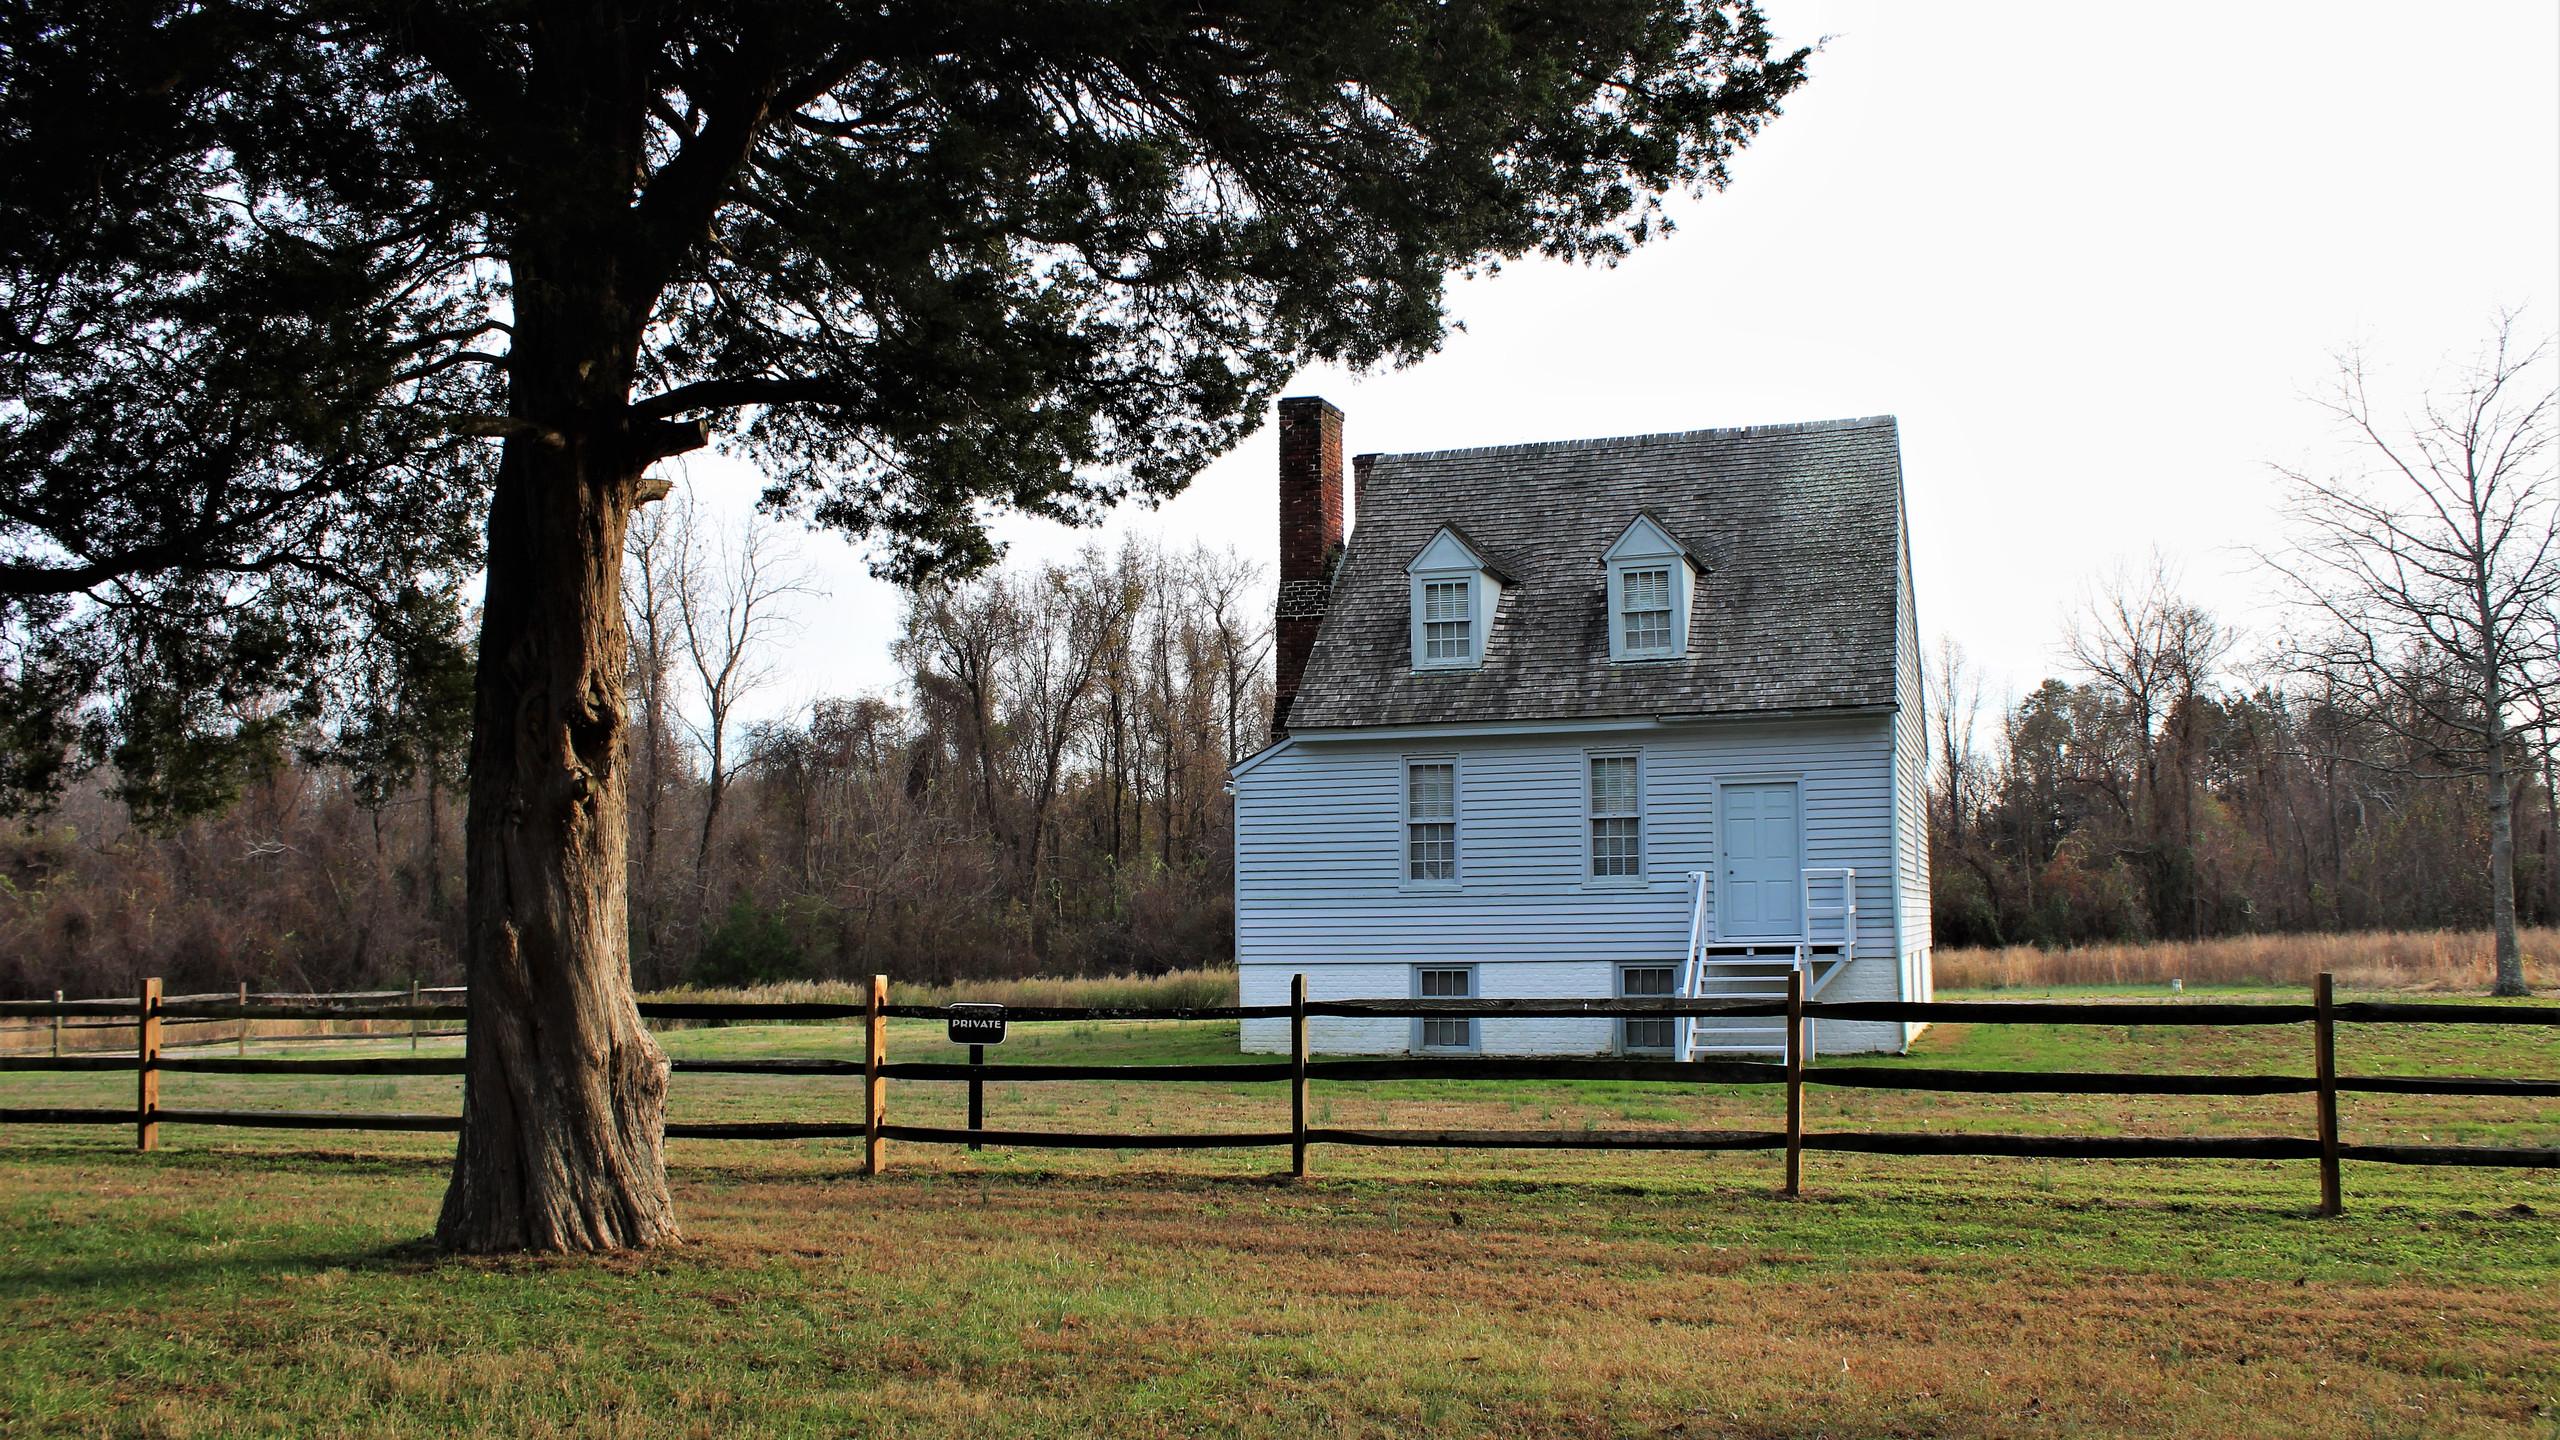 The Watt House at Springfield